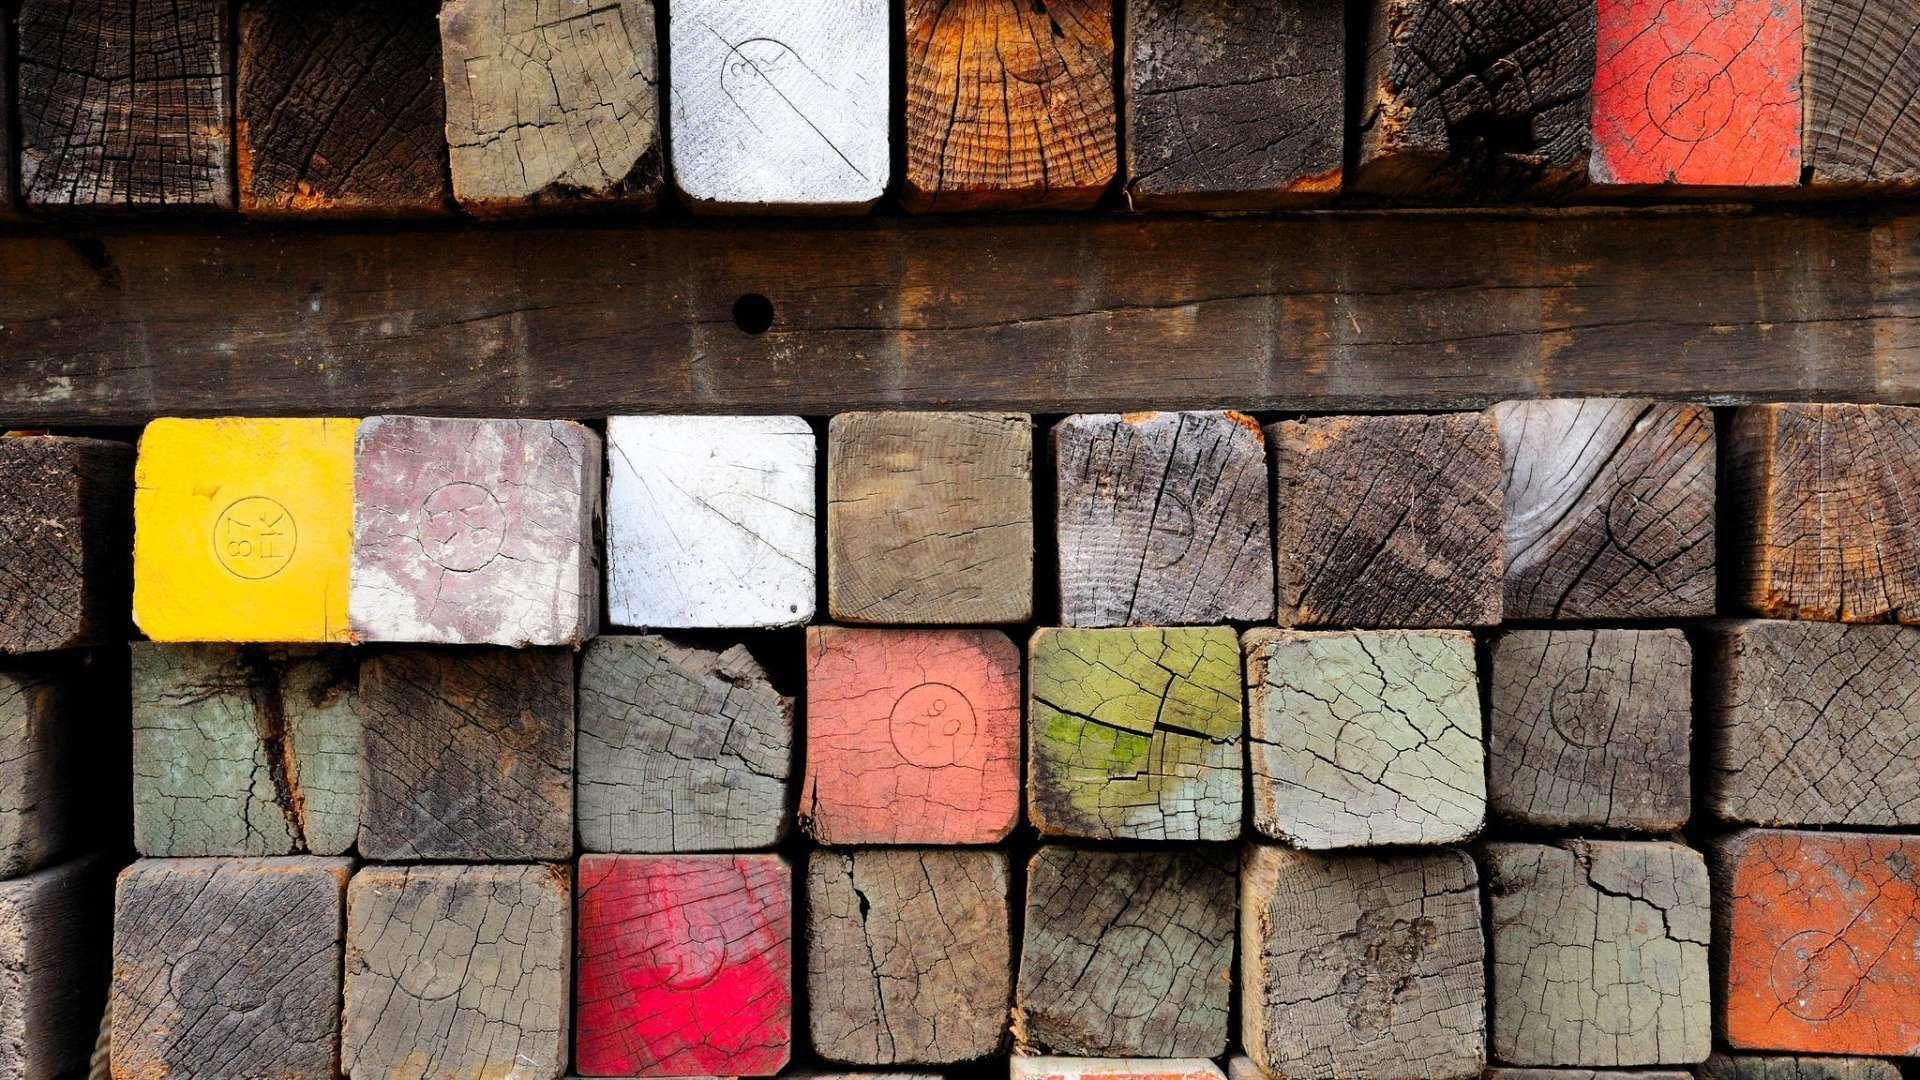 Wood Lumber Paint Many Hd Wallpaper 1080p